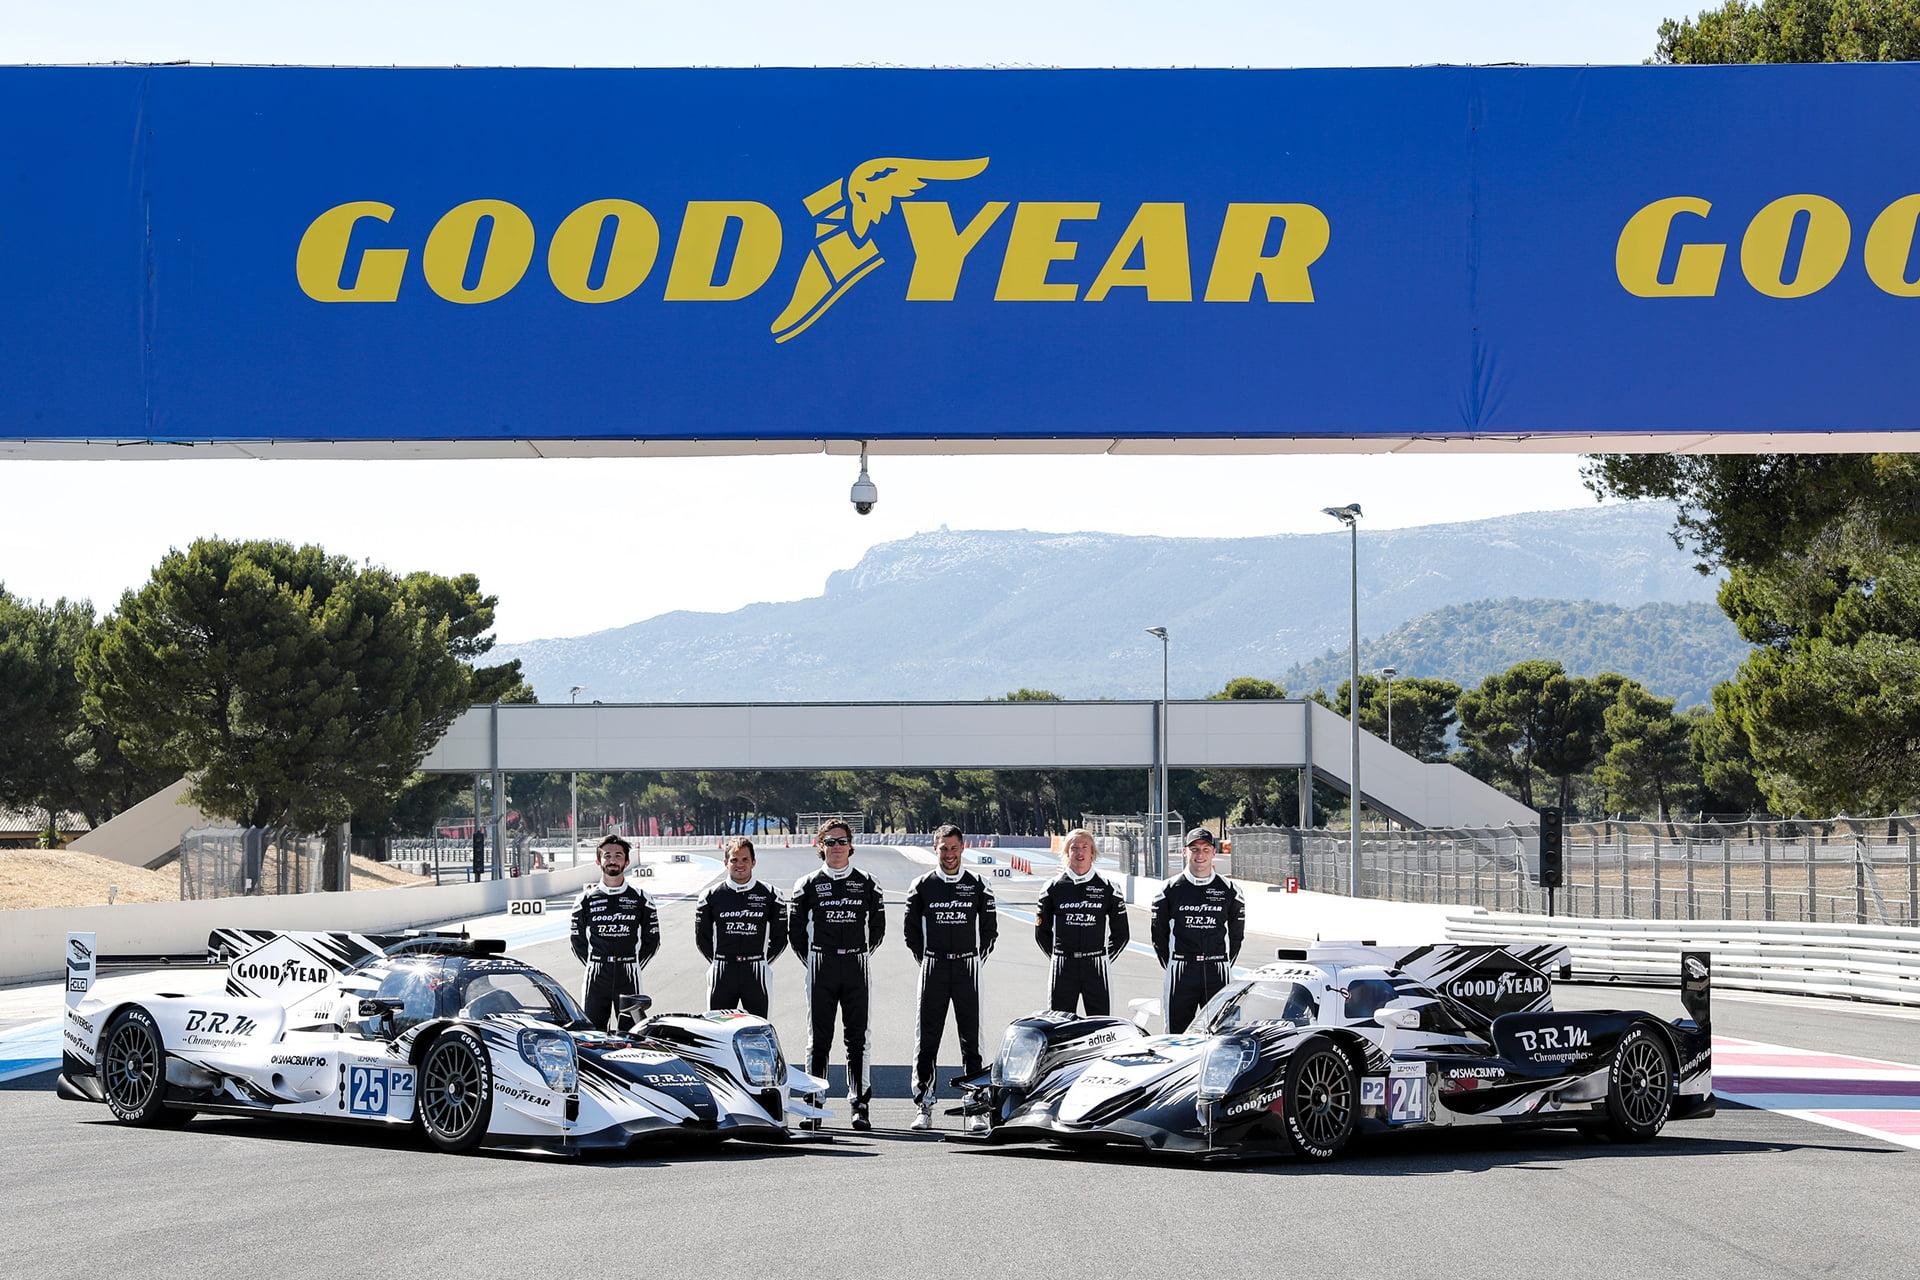 Goodyear crea un línea de relojes deportivos